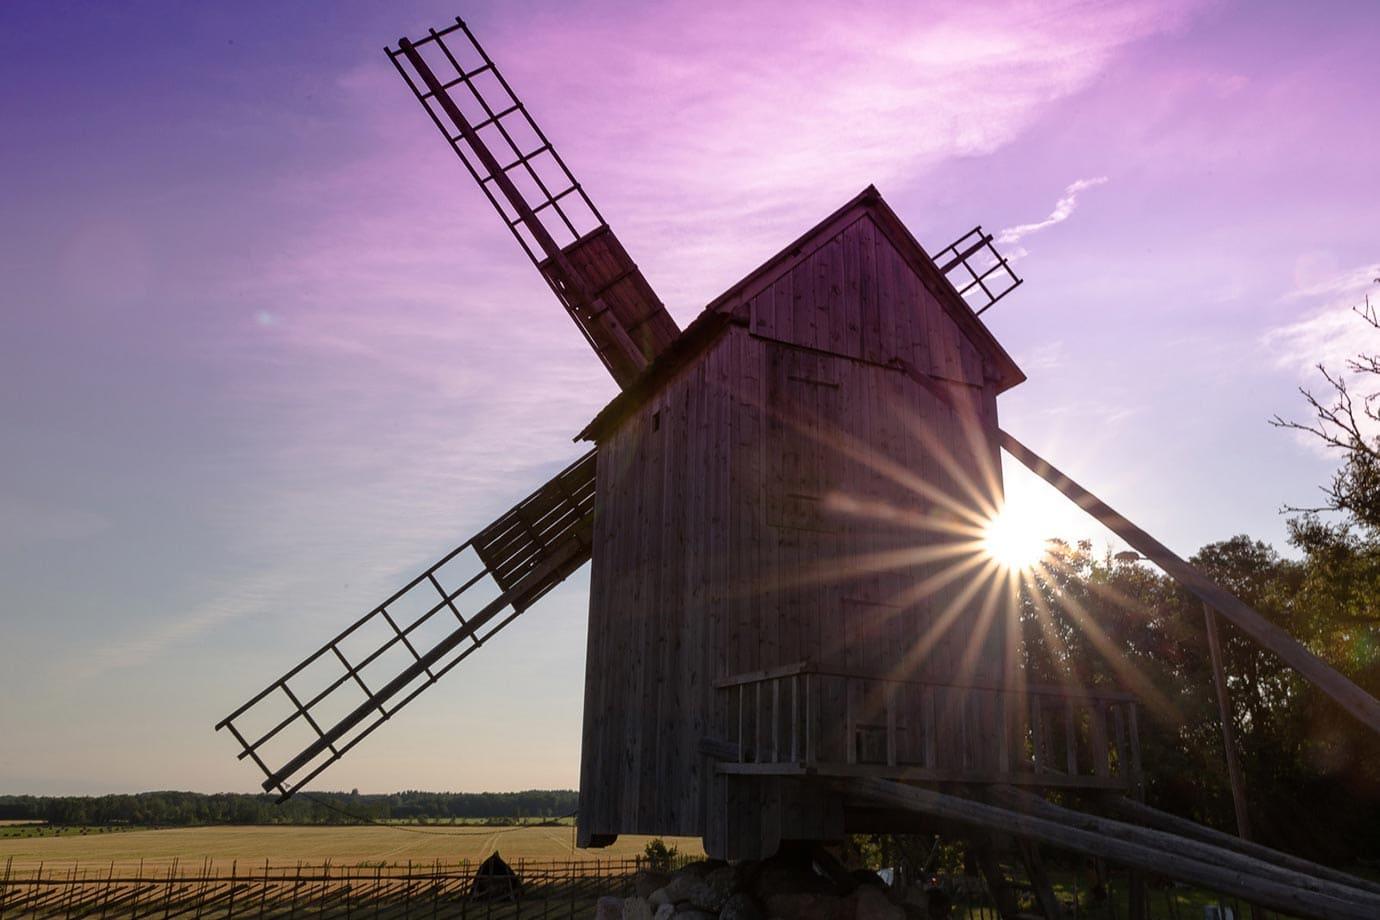 Windmills of Saaremaa, Estonia